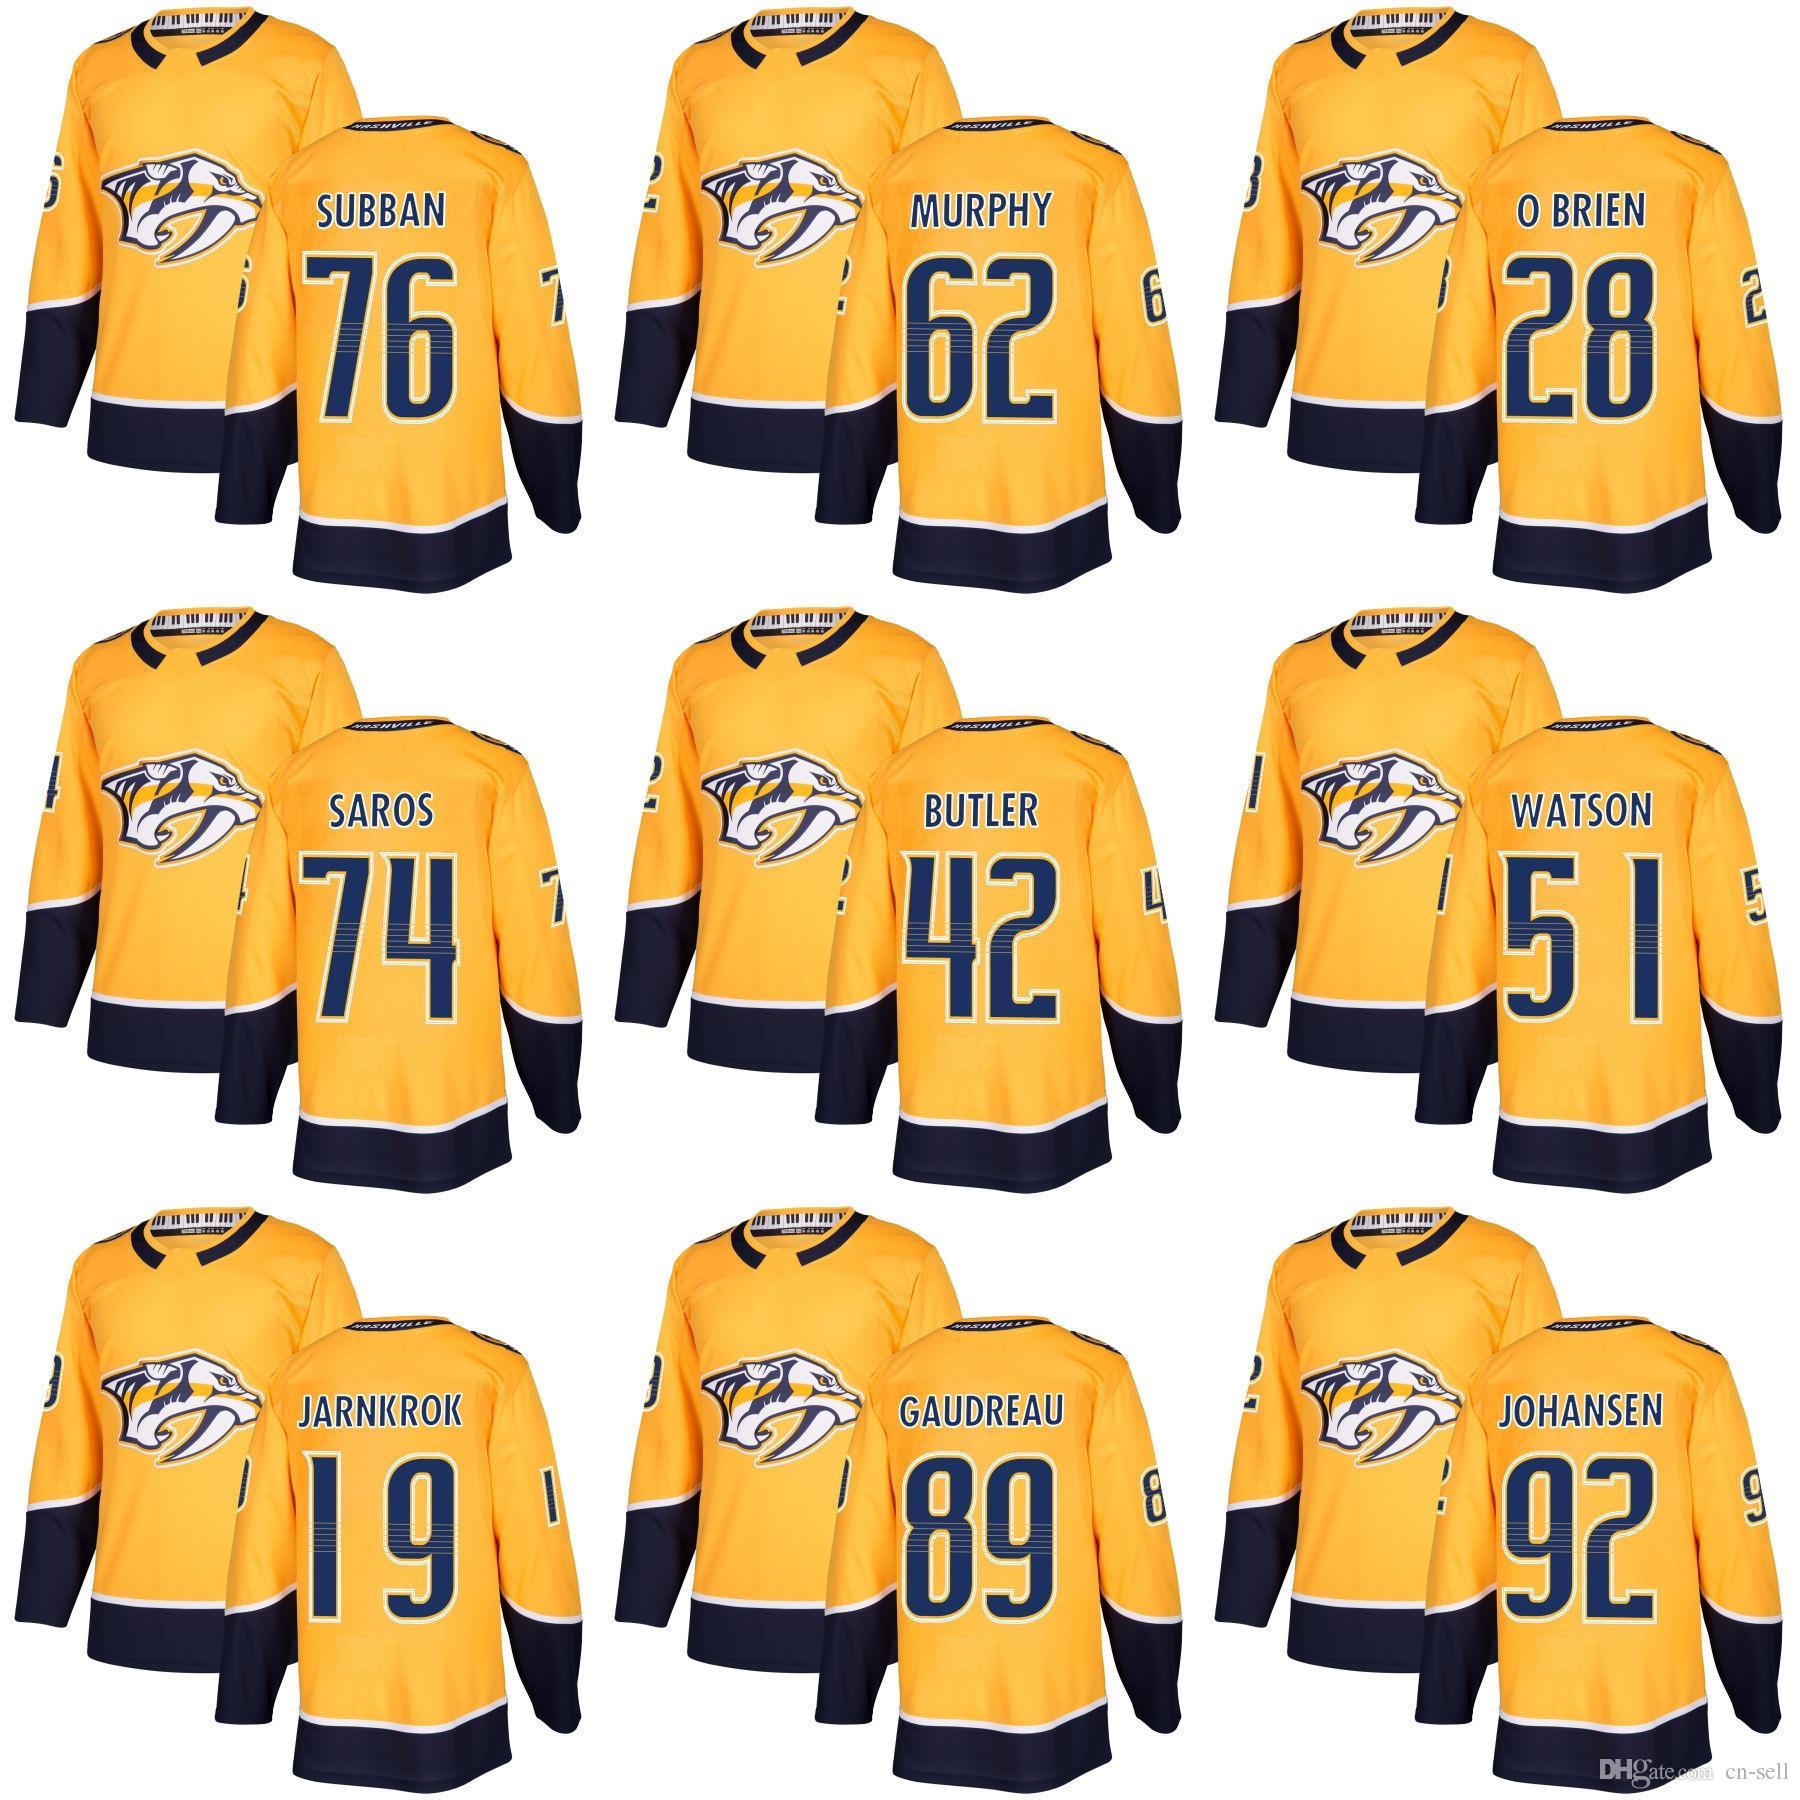 Filip Forsberg Jersey  9 Nashville Predators Home Gold P.K. Subban 62  Murphy 28 Andrew O Brien Gaudreau 92 Johansen 74 Saros Hockey Jerseys UK  2019 From Cn ... 5dfc59cbb